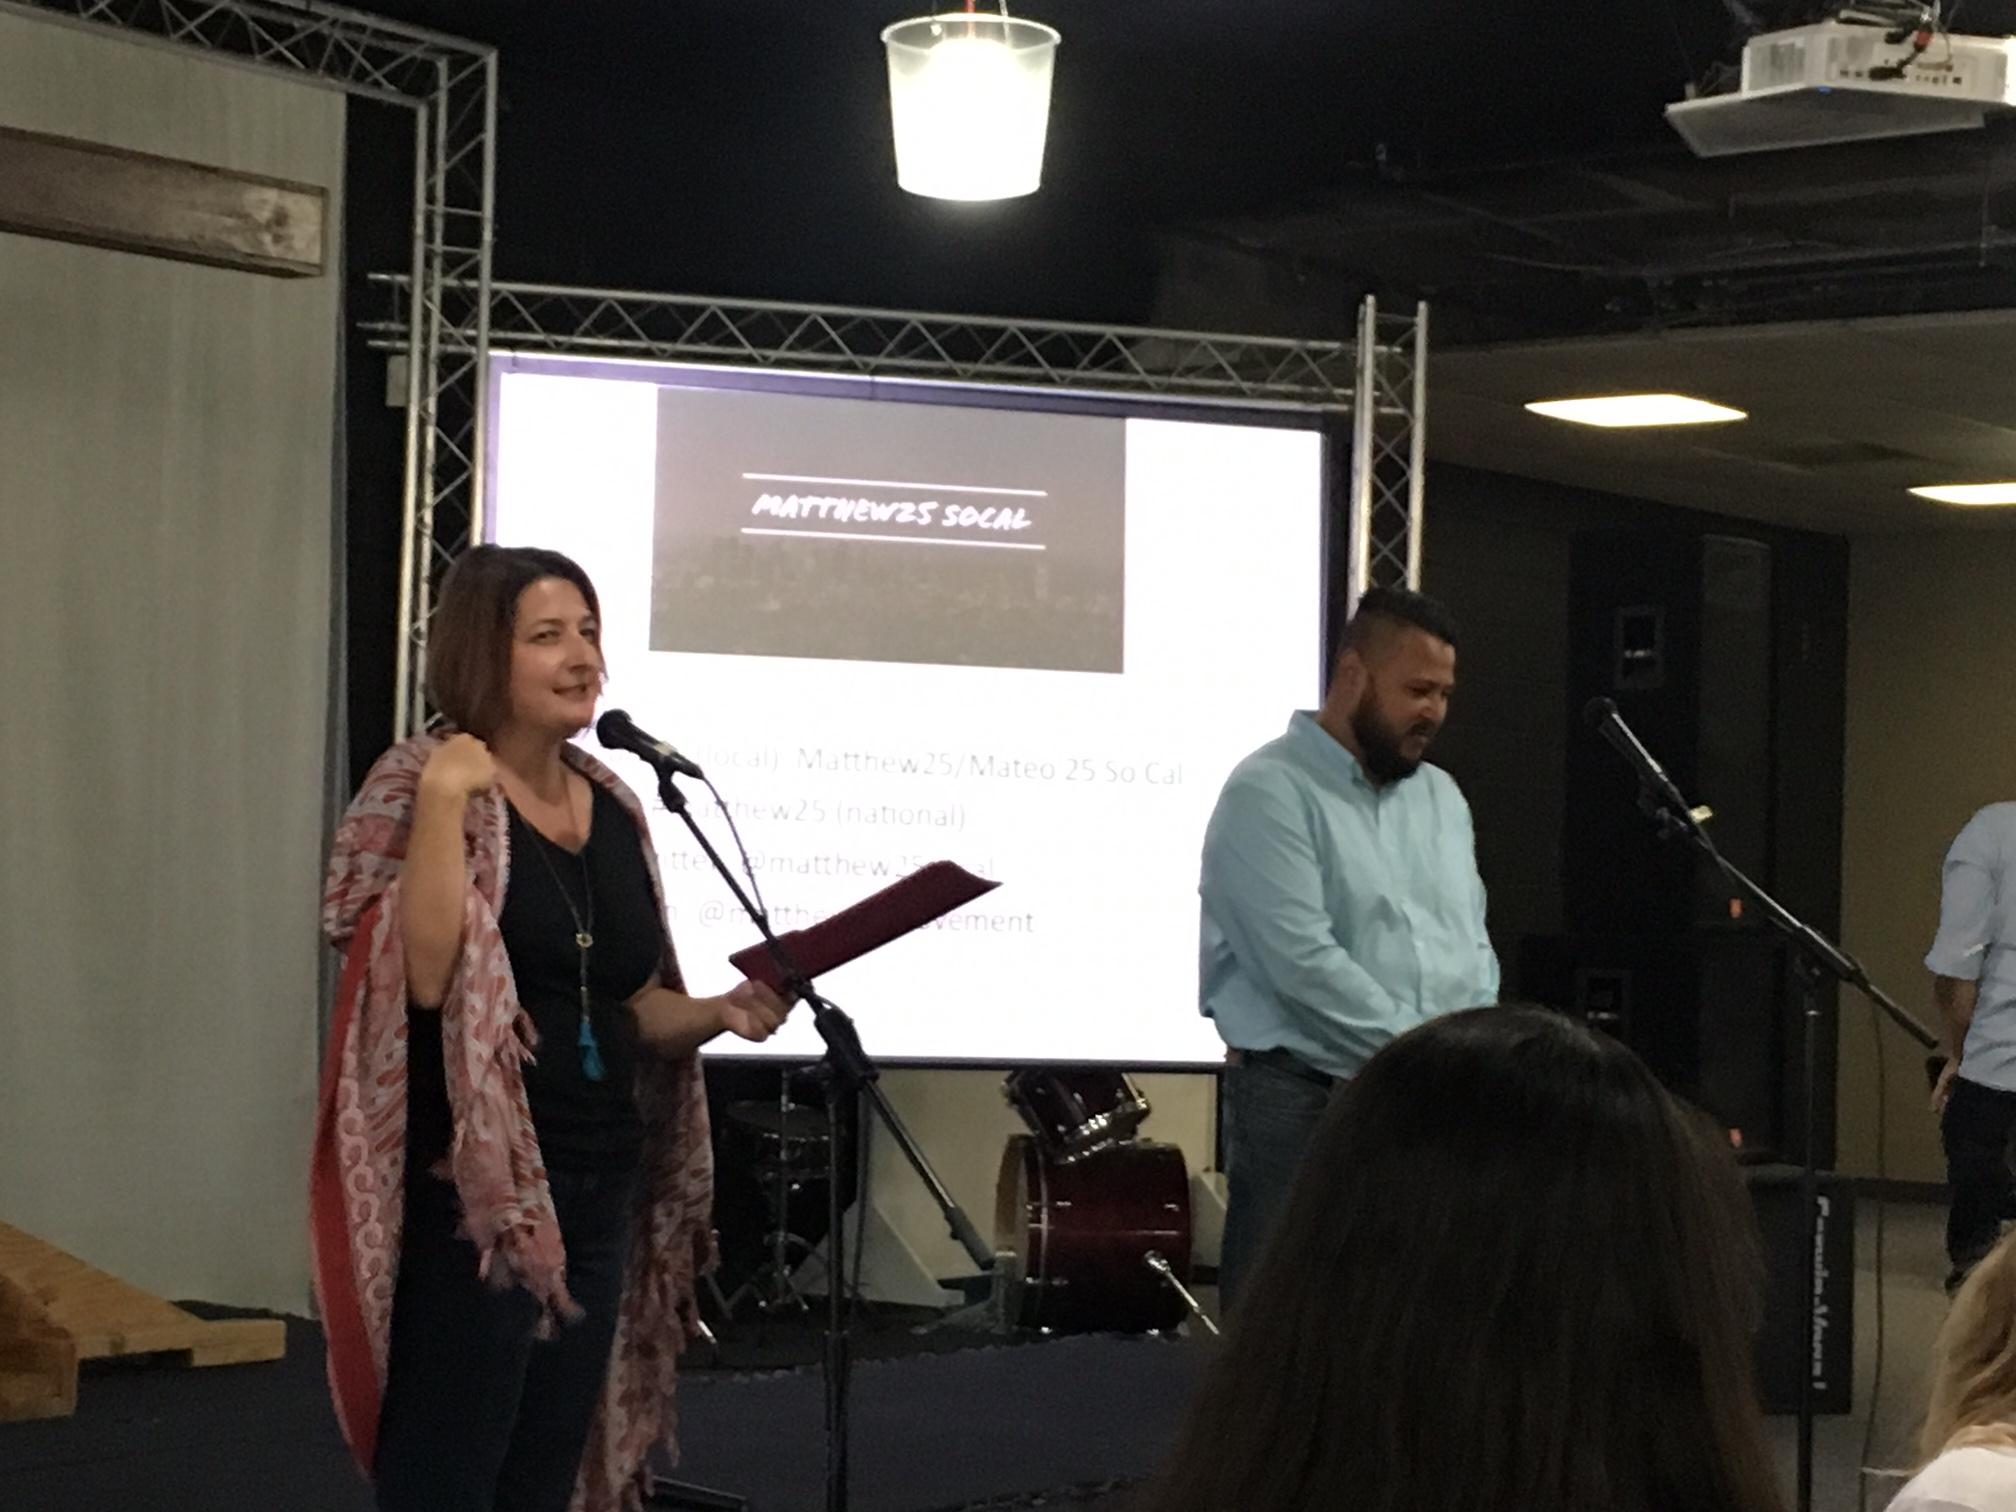 Dr. Robert and Erica Romero introduces Matthew 25 during leadership meeting